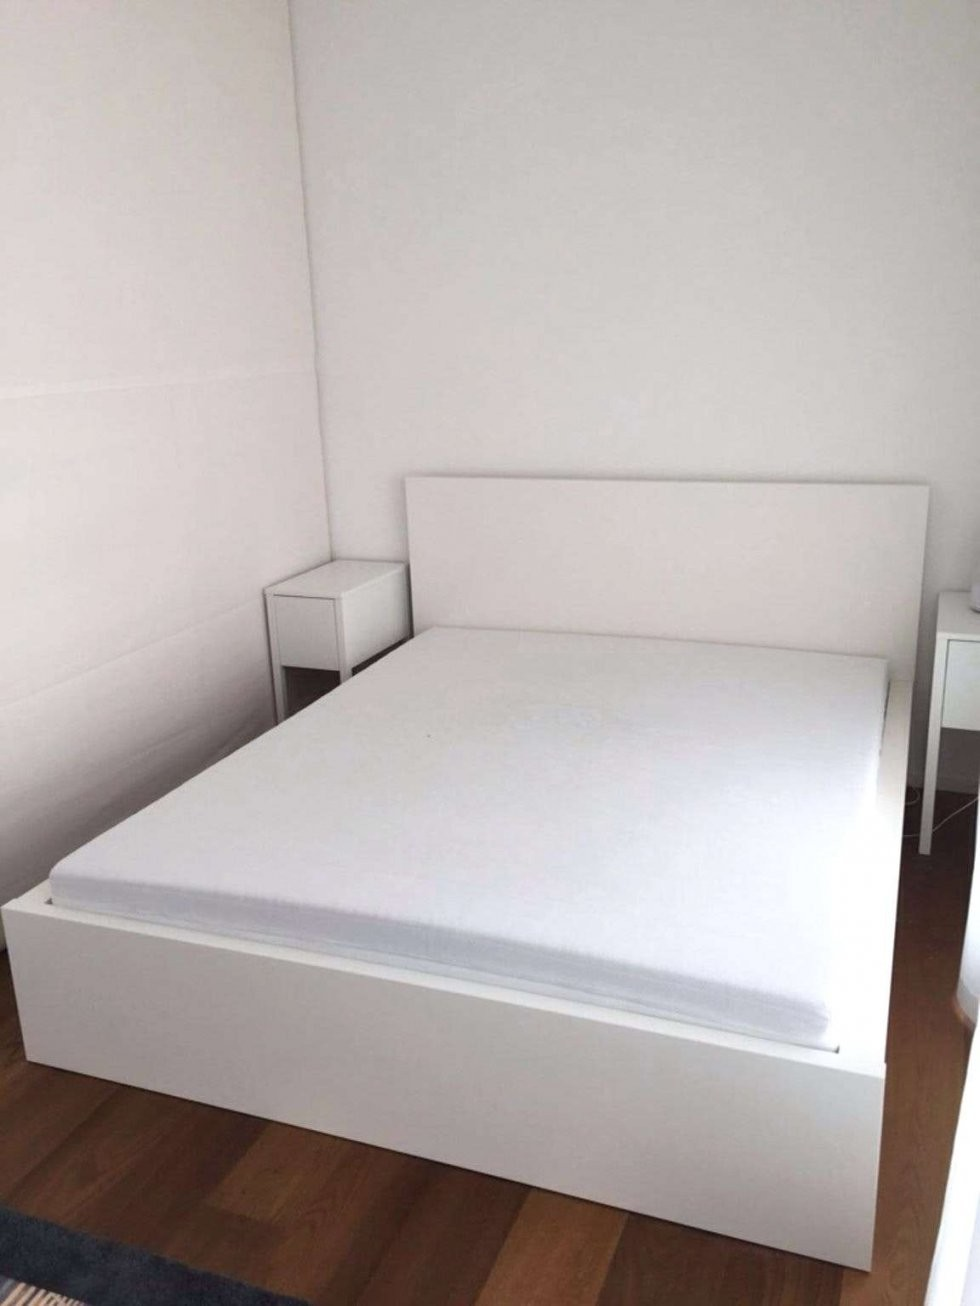 Ikea Malm Bett 140X200 Weiss Entwurf Bett Weiß 140X200  1291Swizz von Ikea Bett Malm 140X200 Weiß Photo